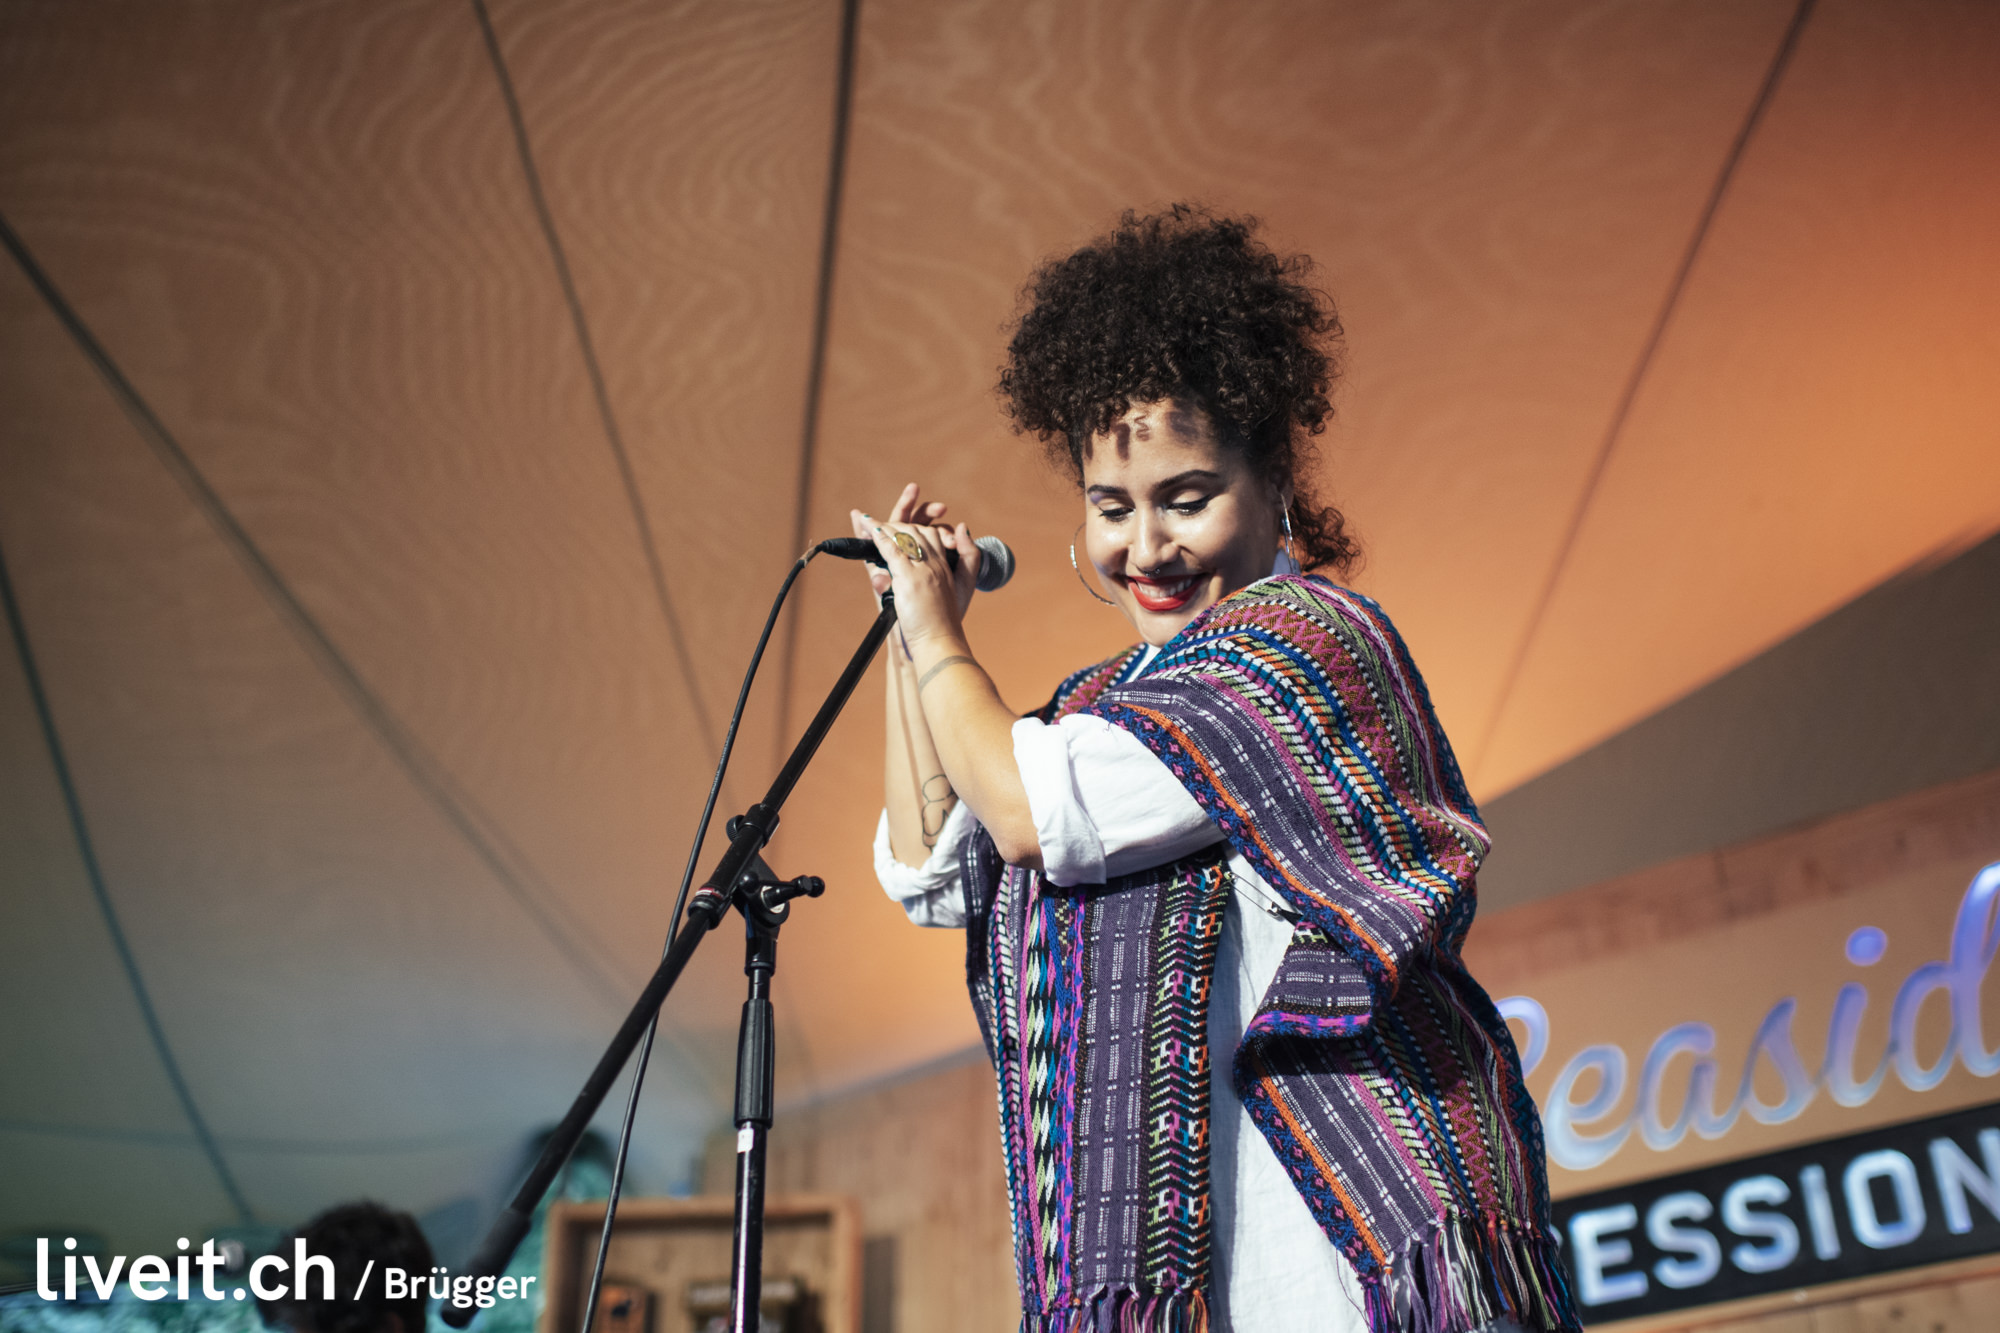 Annie Goodchild am Seaside Festival 2019